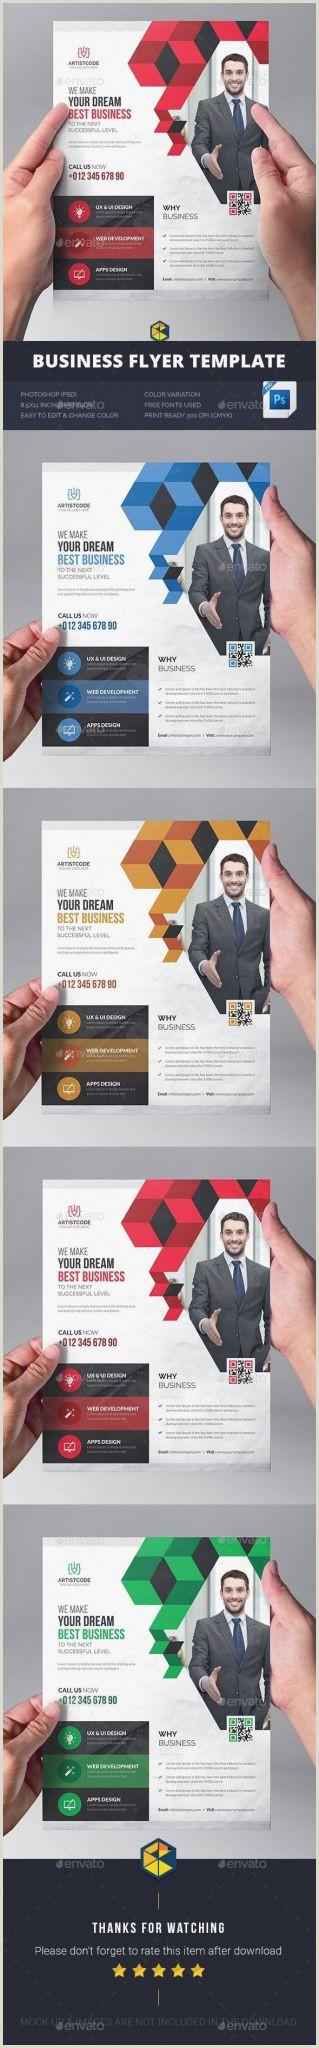 Best Business Card Designer Herbalife Flyer Template